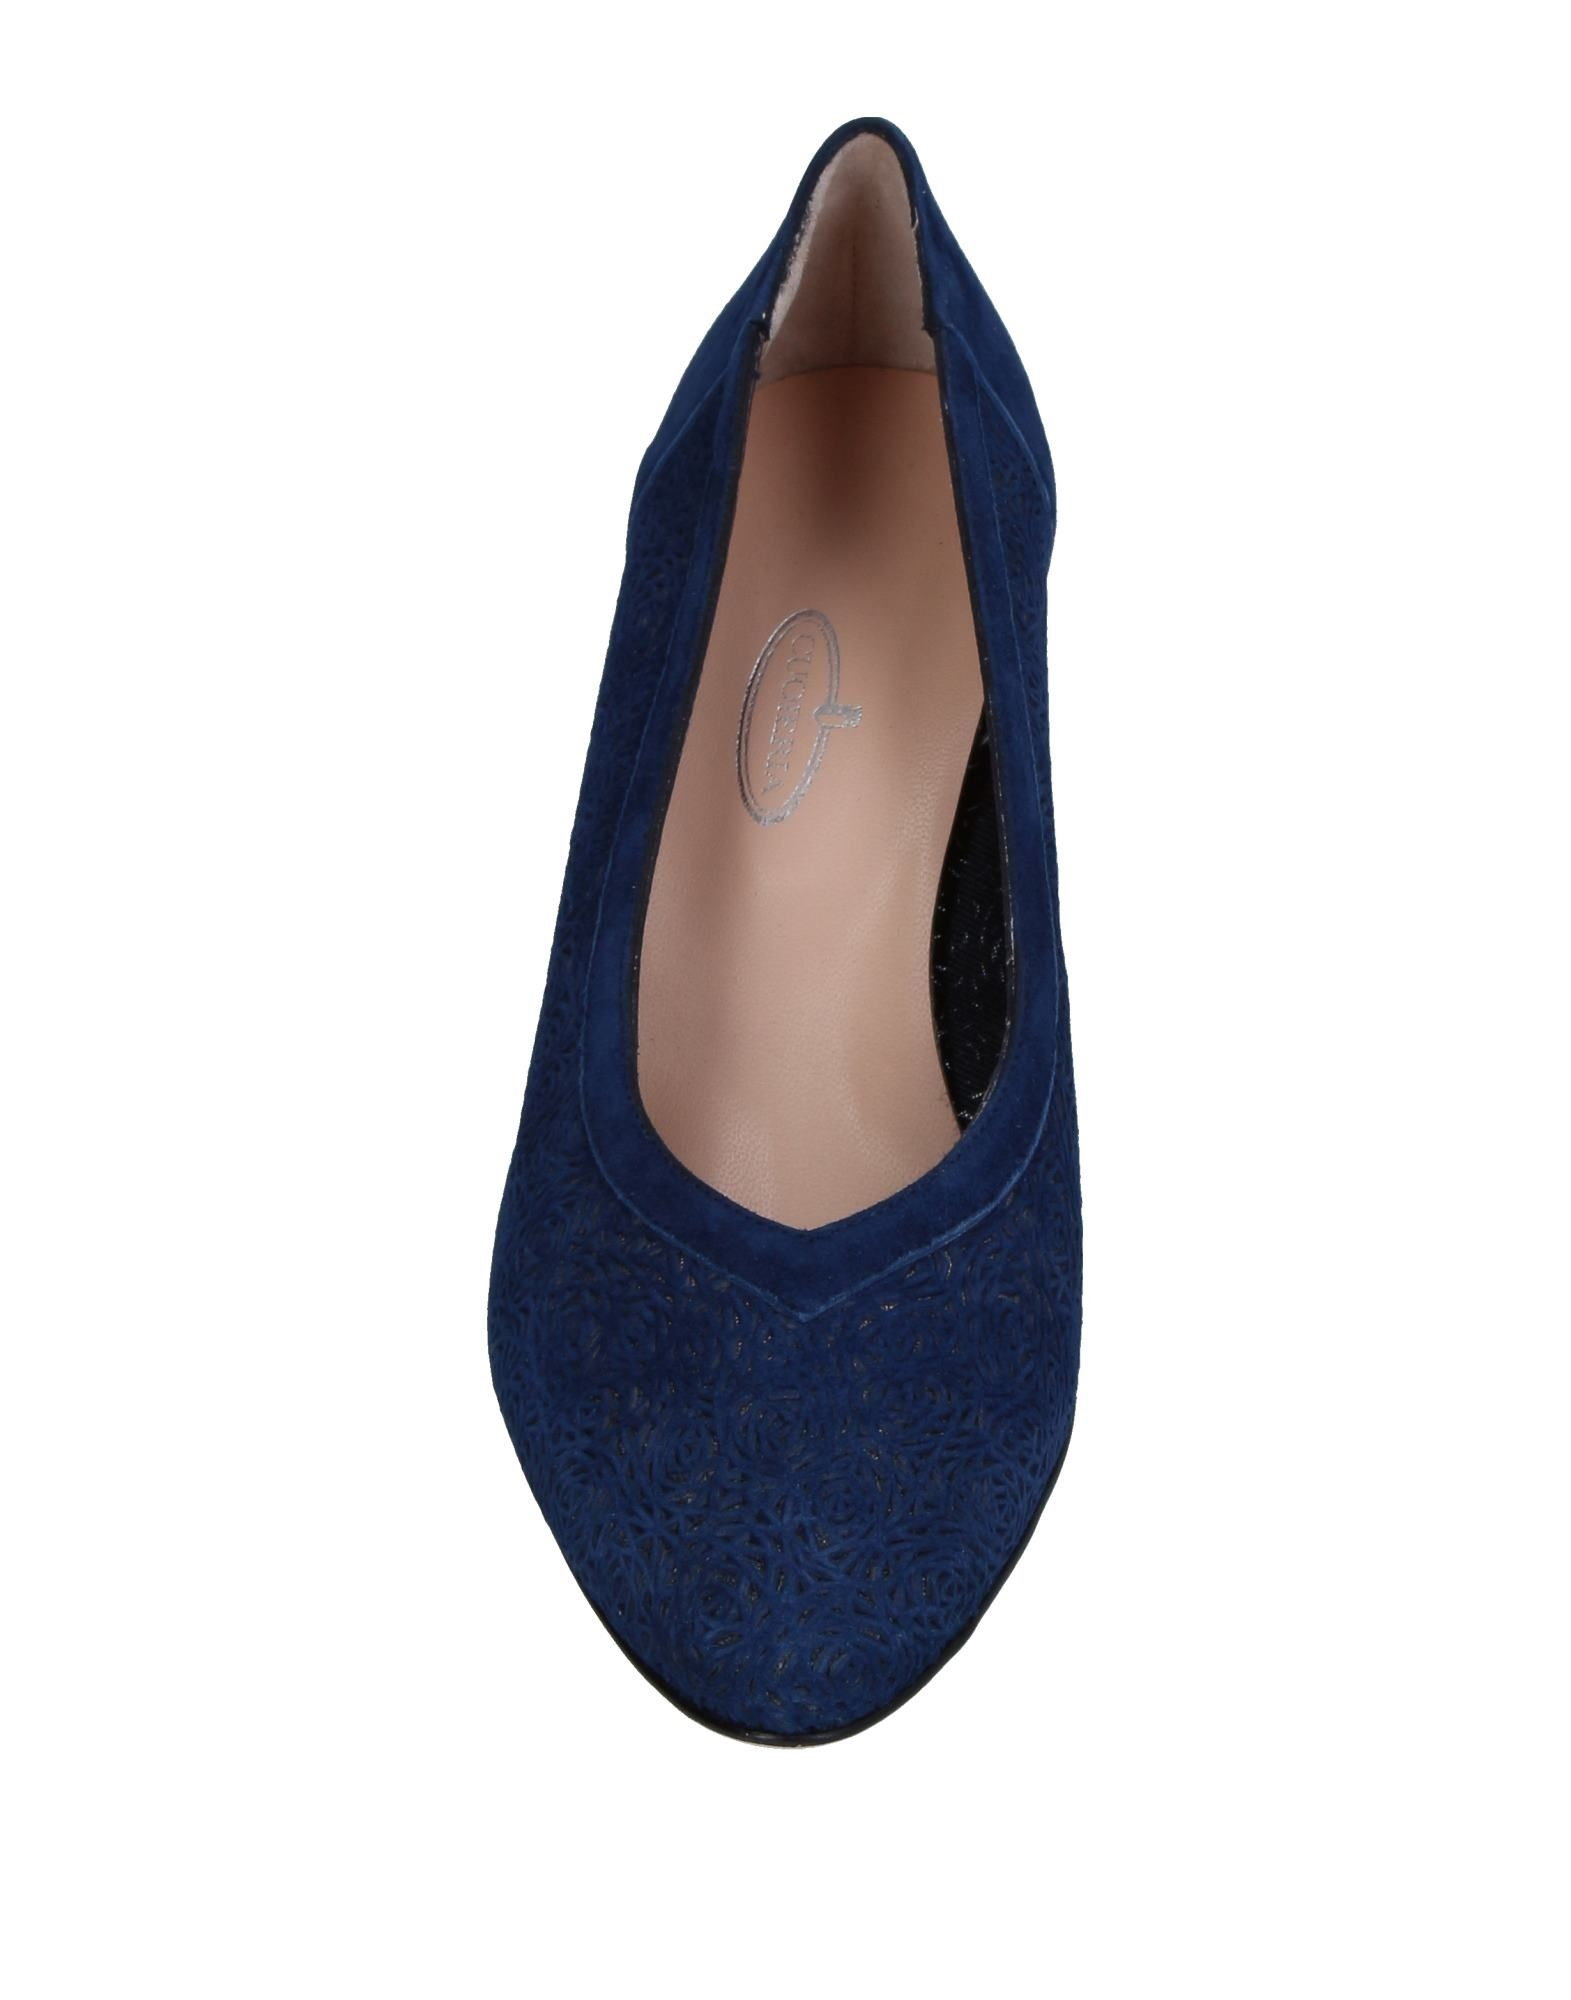 Cuoieria Pumps Damen beliebte  11358971WL Gute Qualität beliebte Damen Schuhe 7cb45b